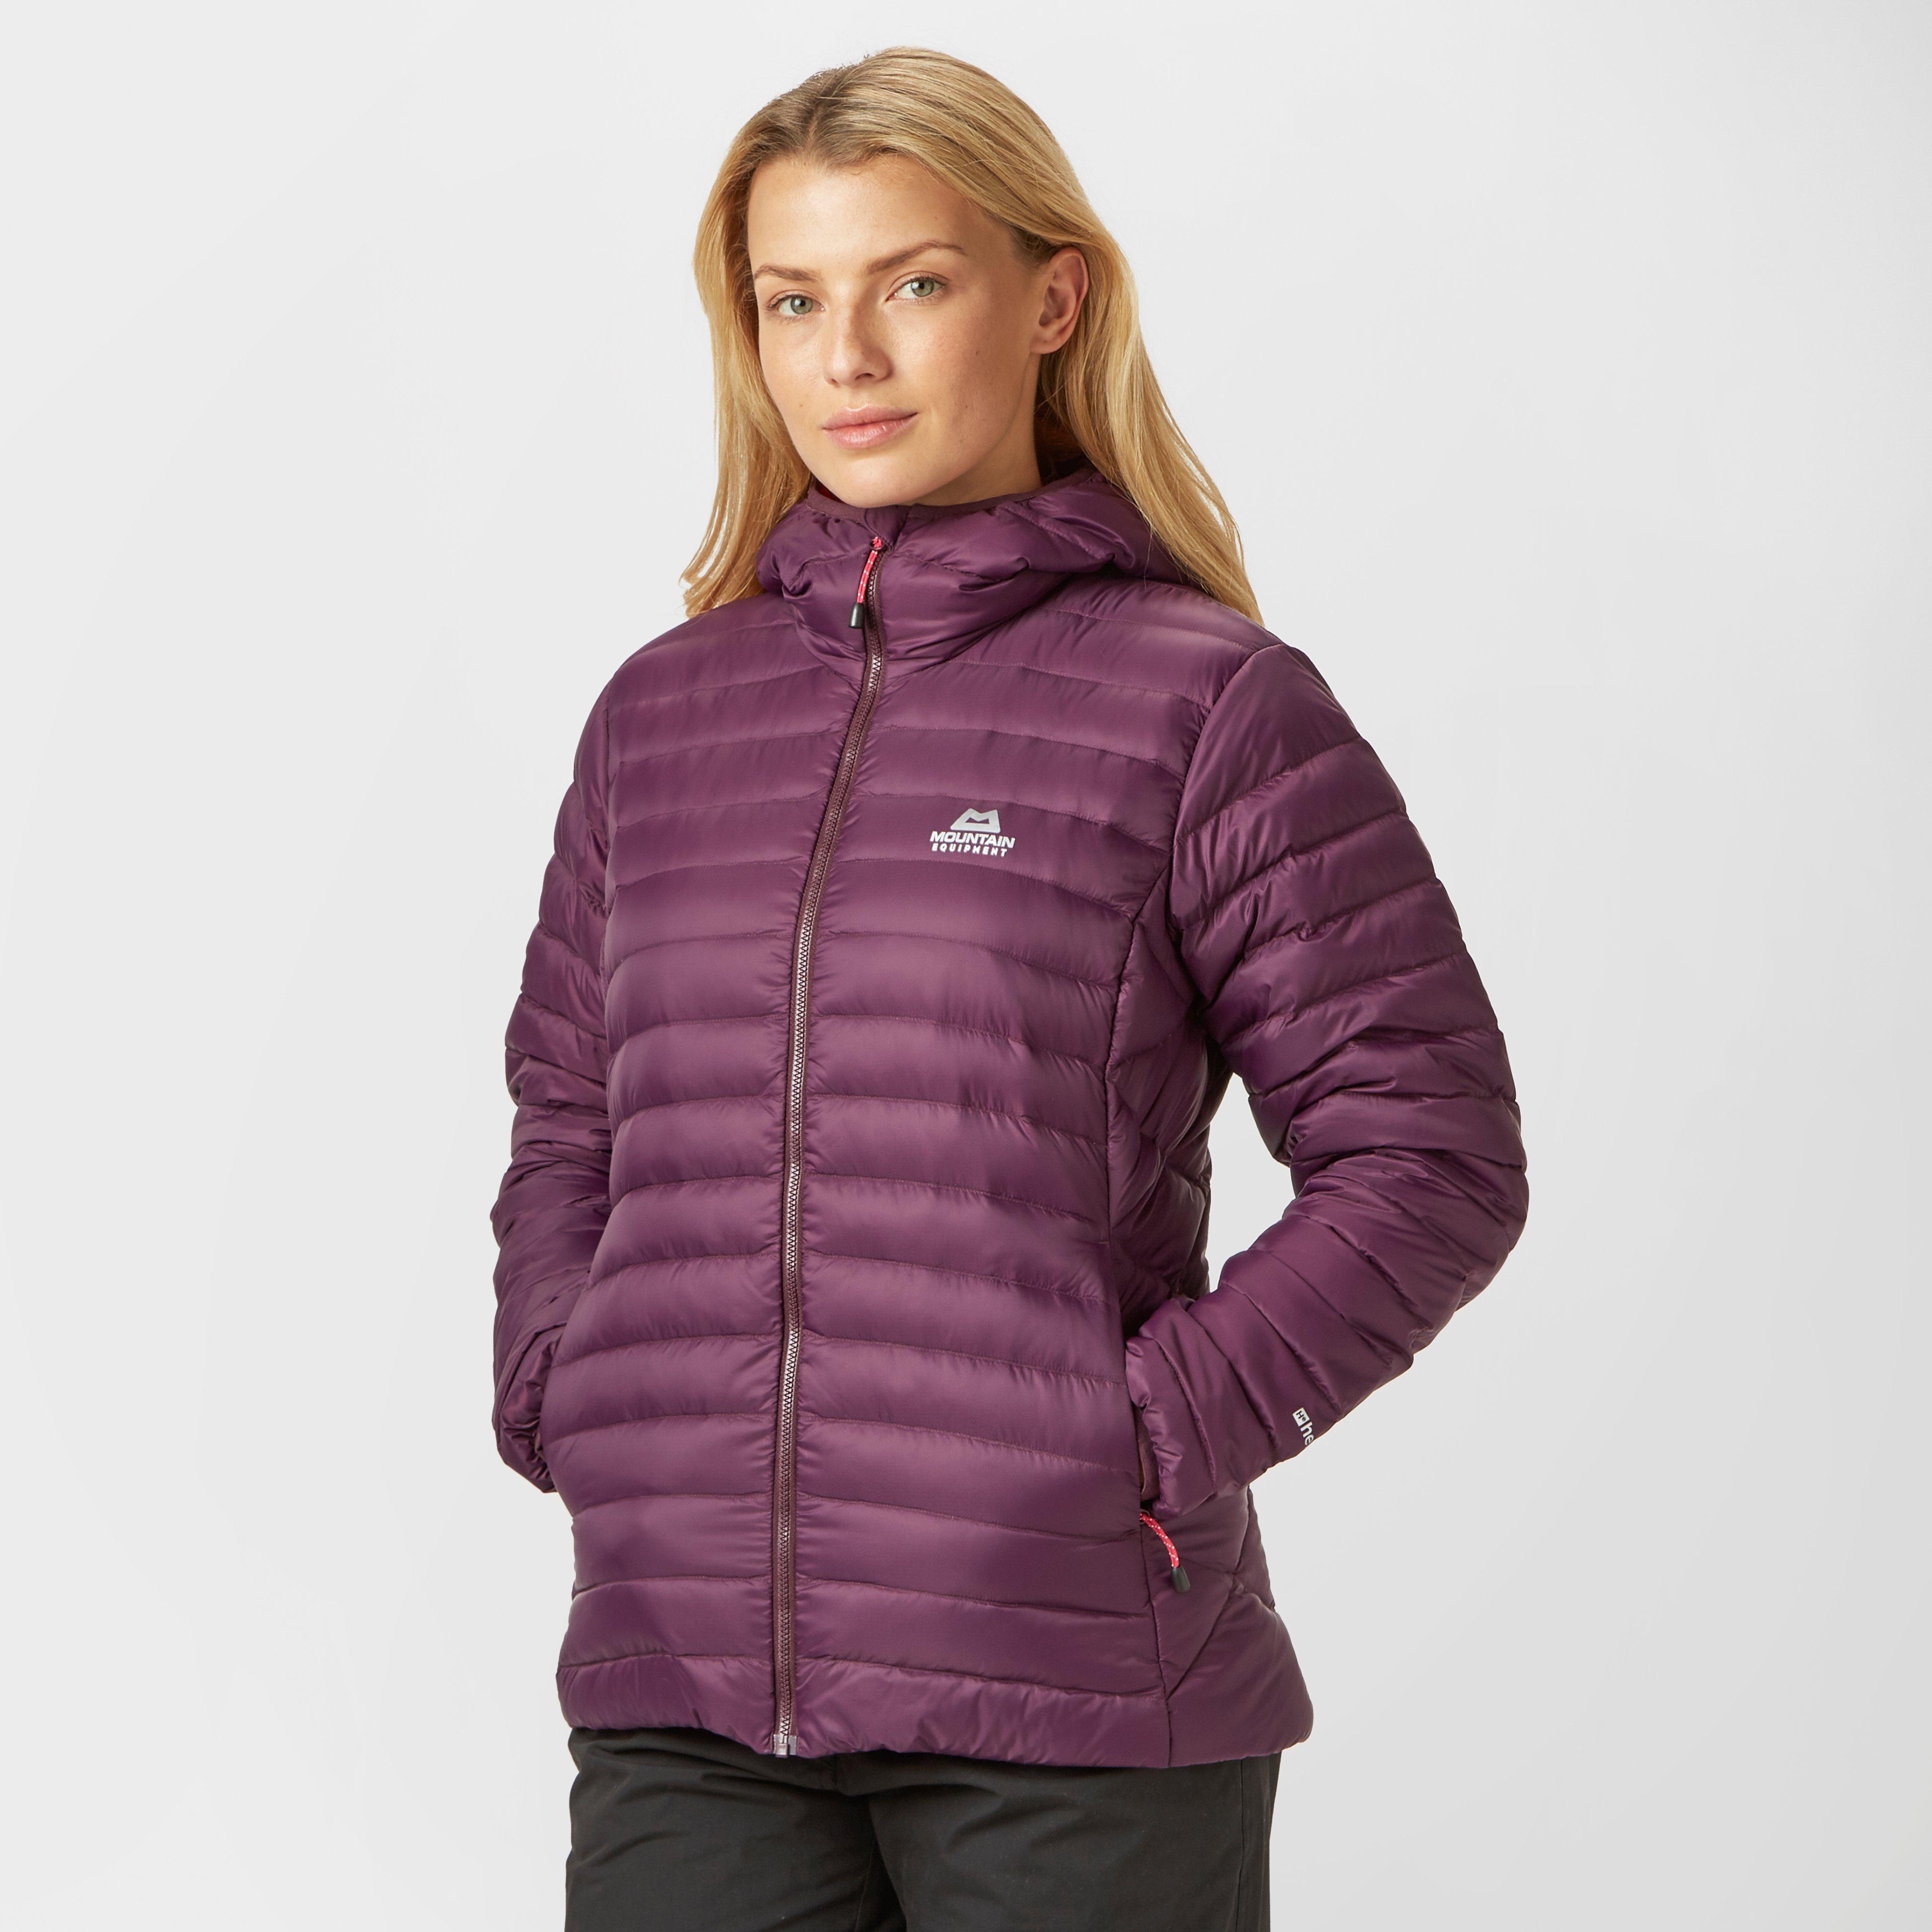 Mountain Equipment Mountain Equipment Womens Arete Hooded Down Jacket - Purple, Purple